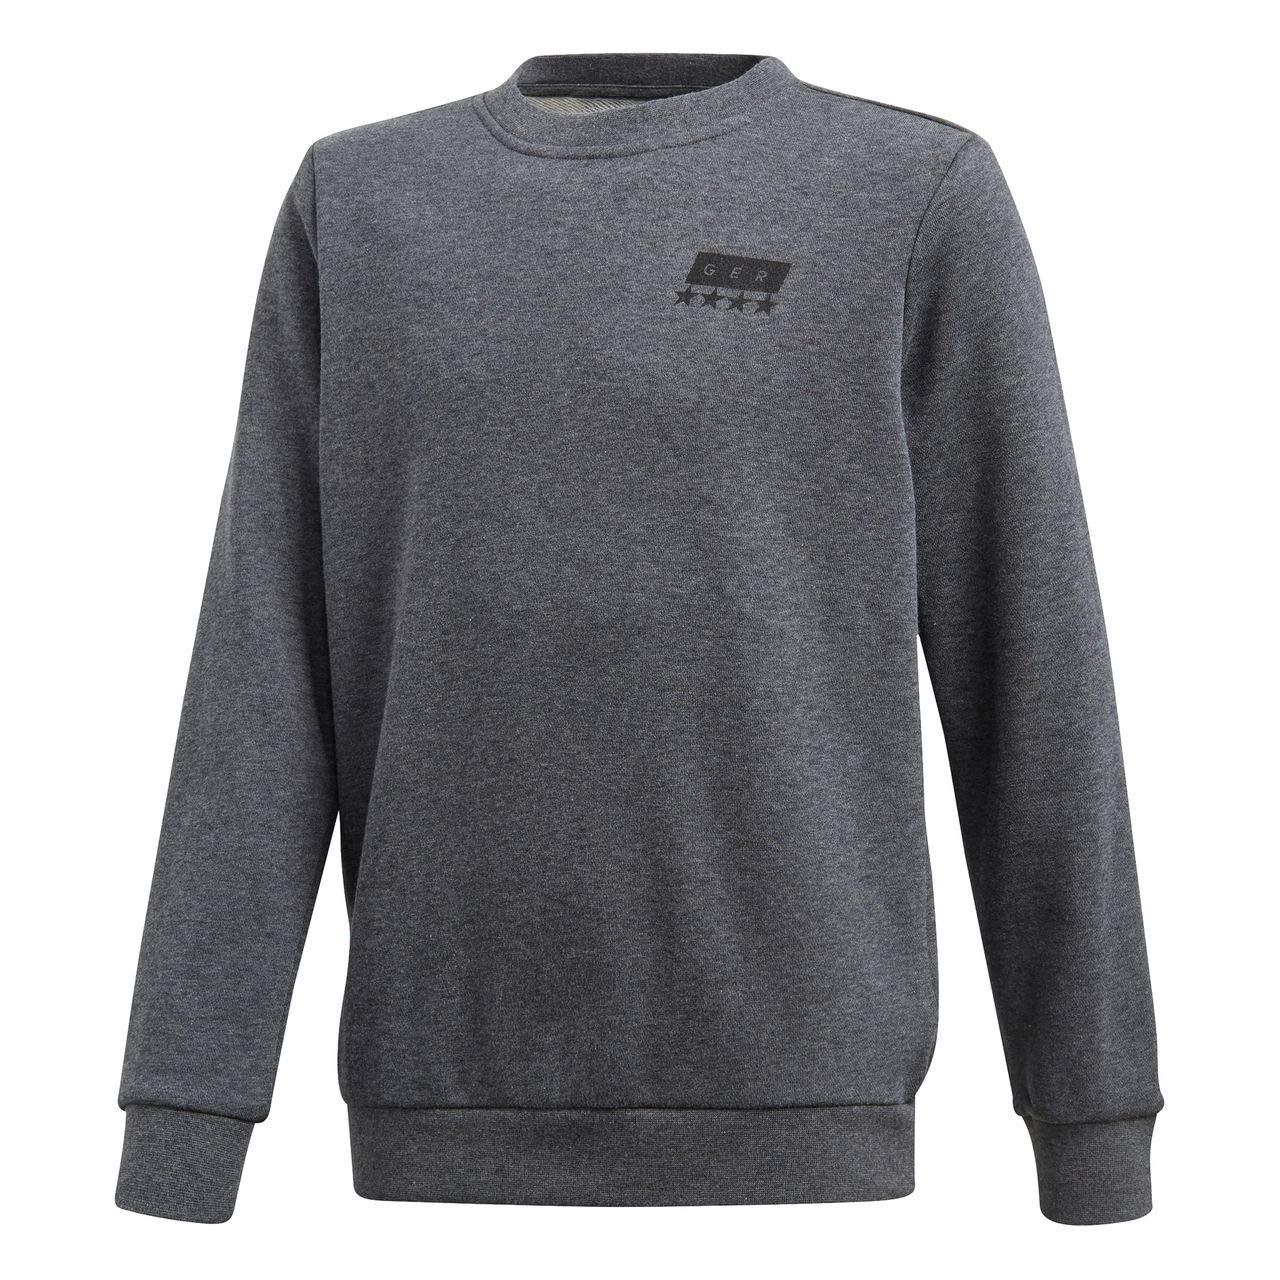 Adidas Kinder DFB Street Graphic Crew Sweat Sweatshirt